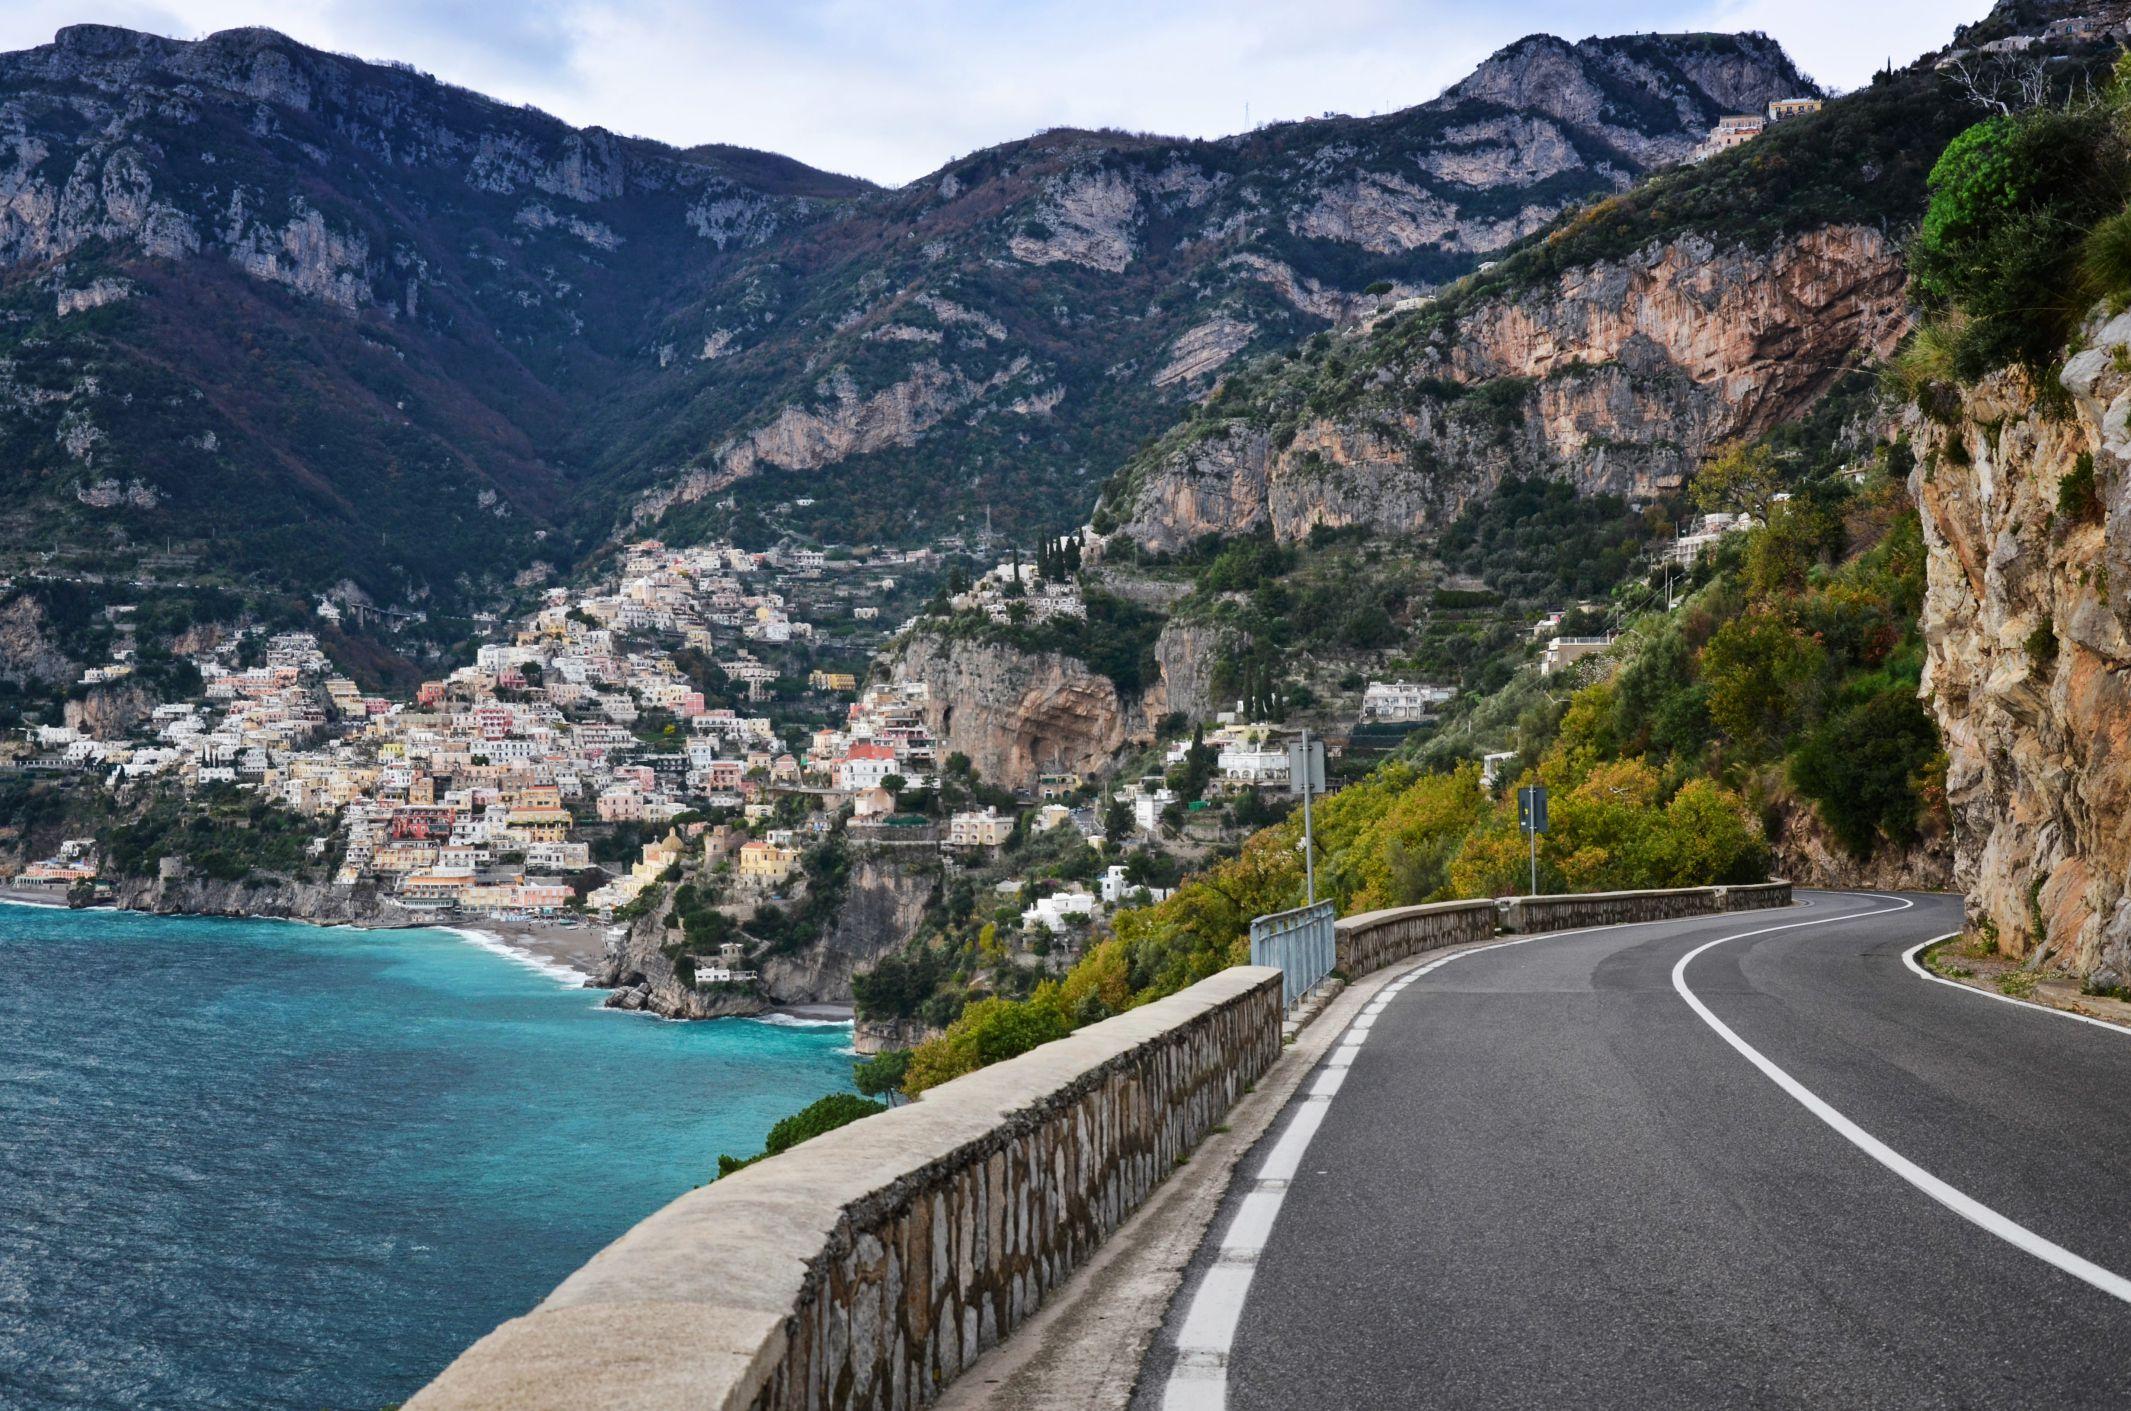 The Best Road Trip Sights On The Amalfi Coast